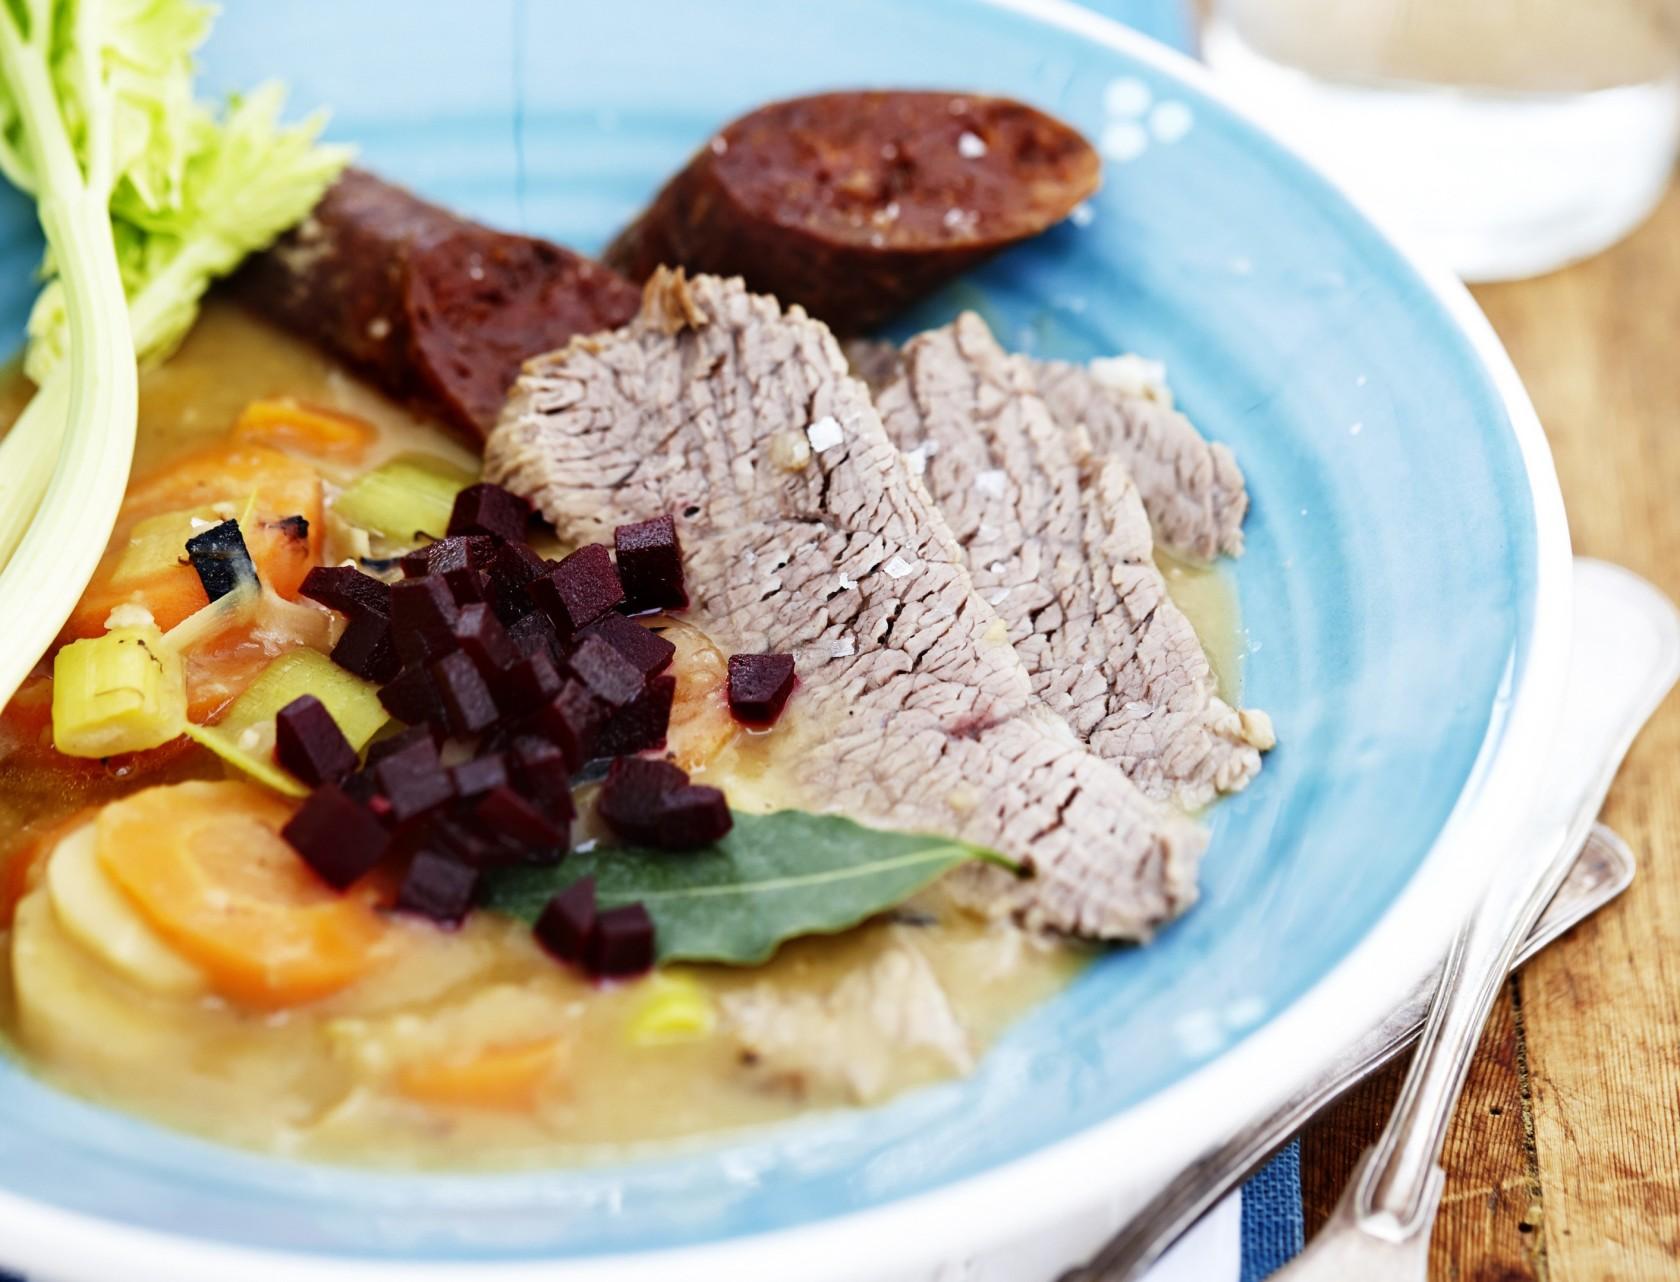 Gule ærter med rodfrugter og kalvekød